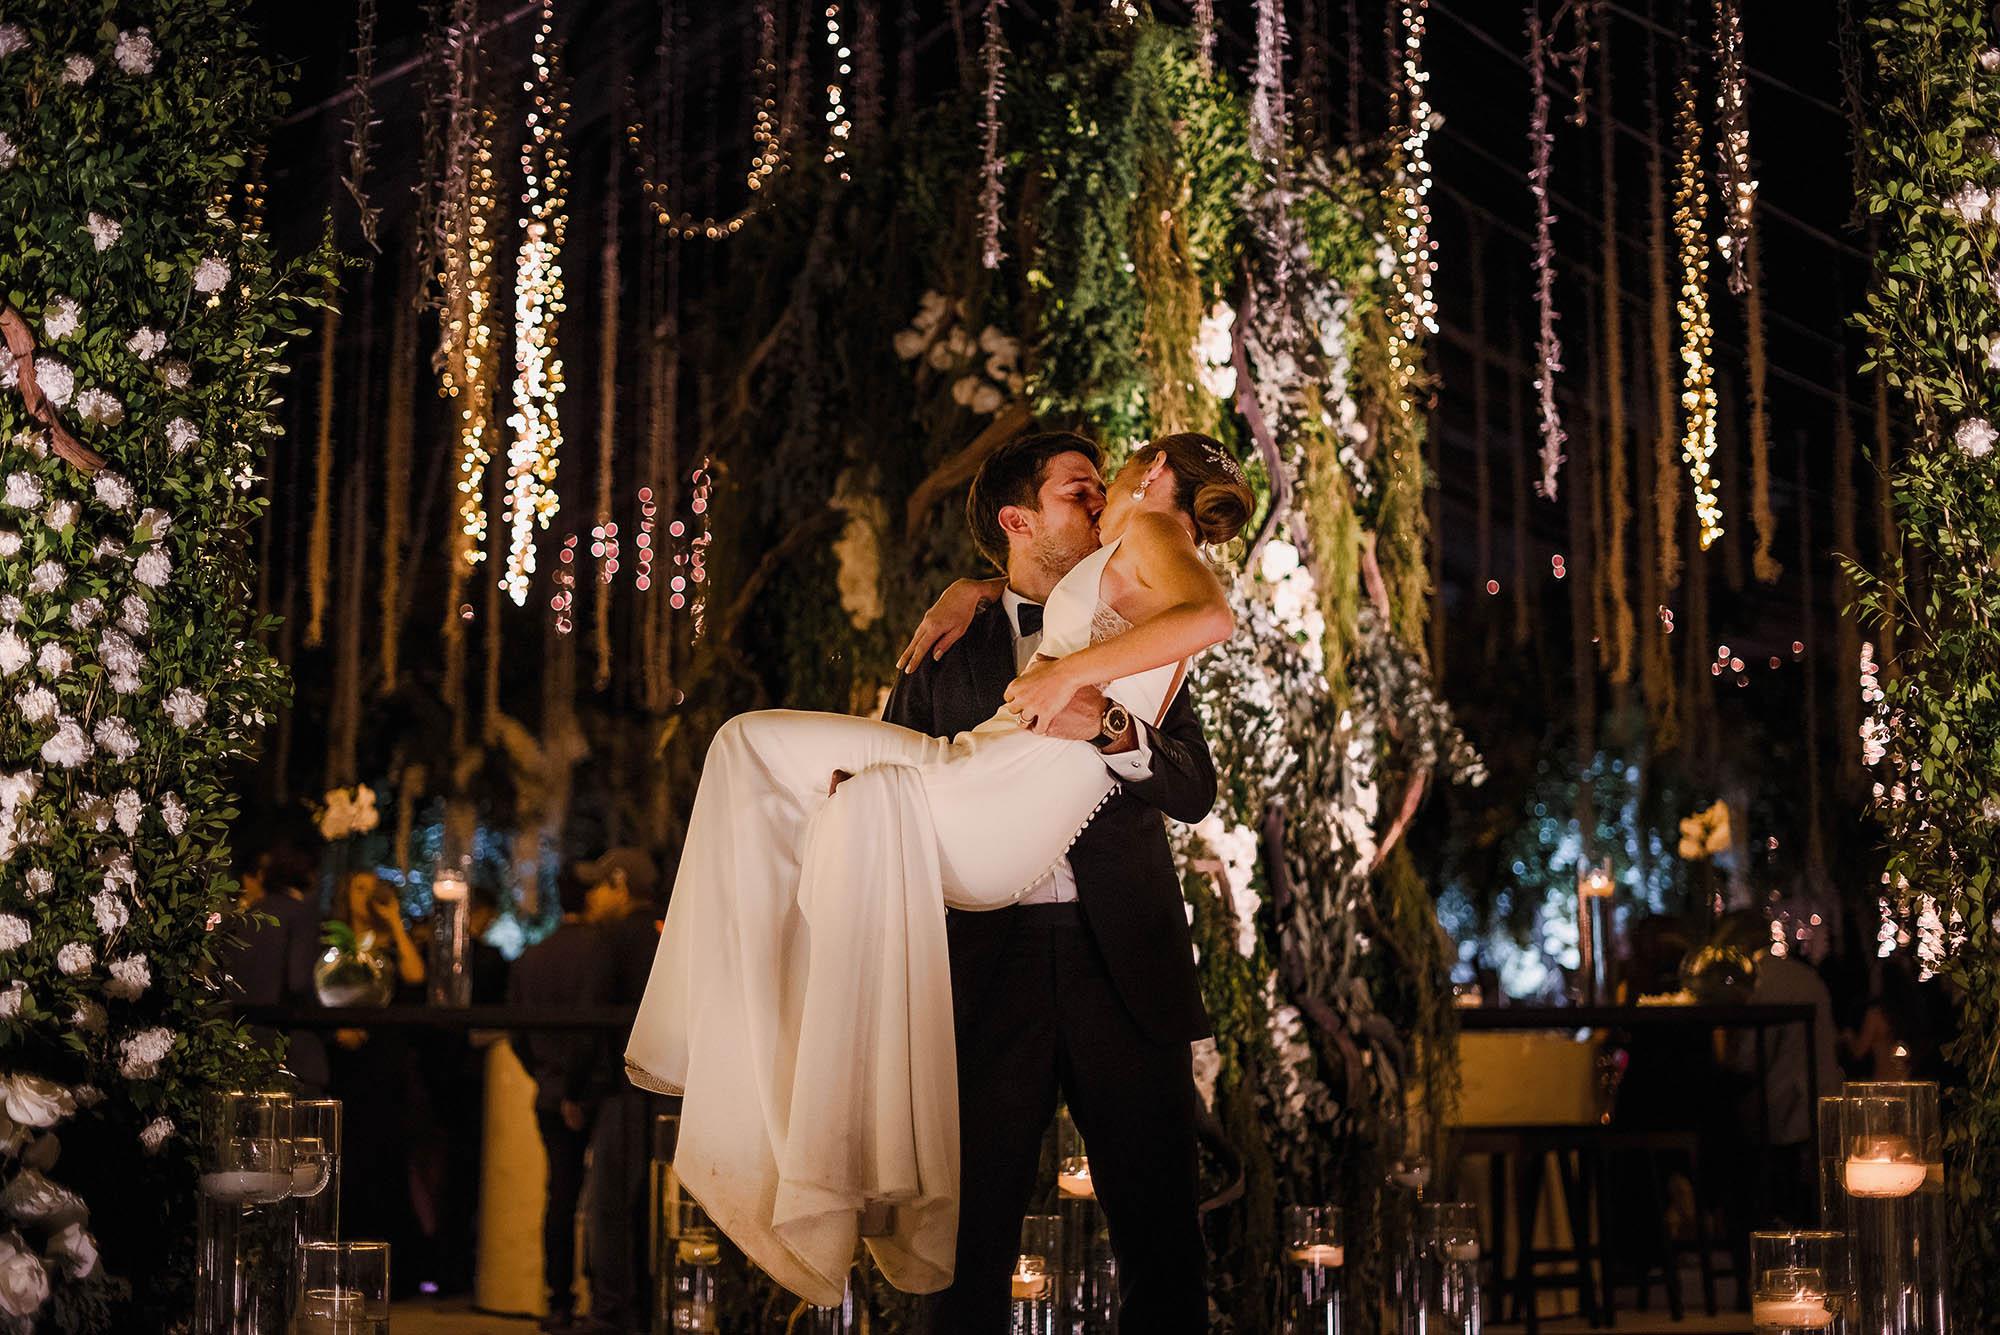 magali fotografo hacienda escoba guadalajara boda wedding 39.jpg